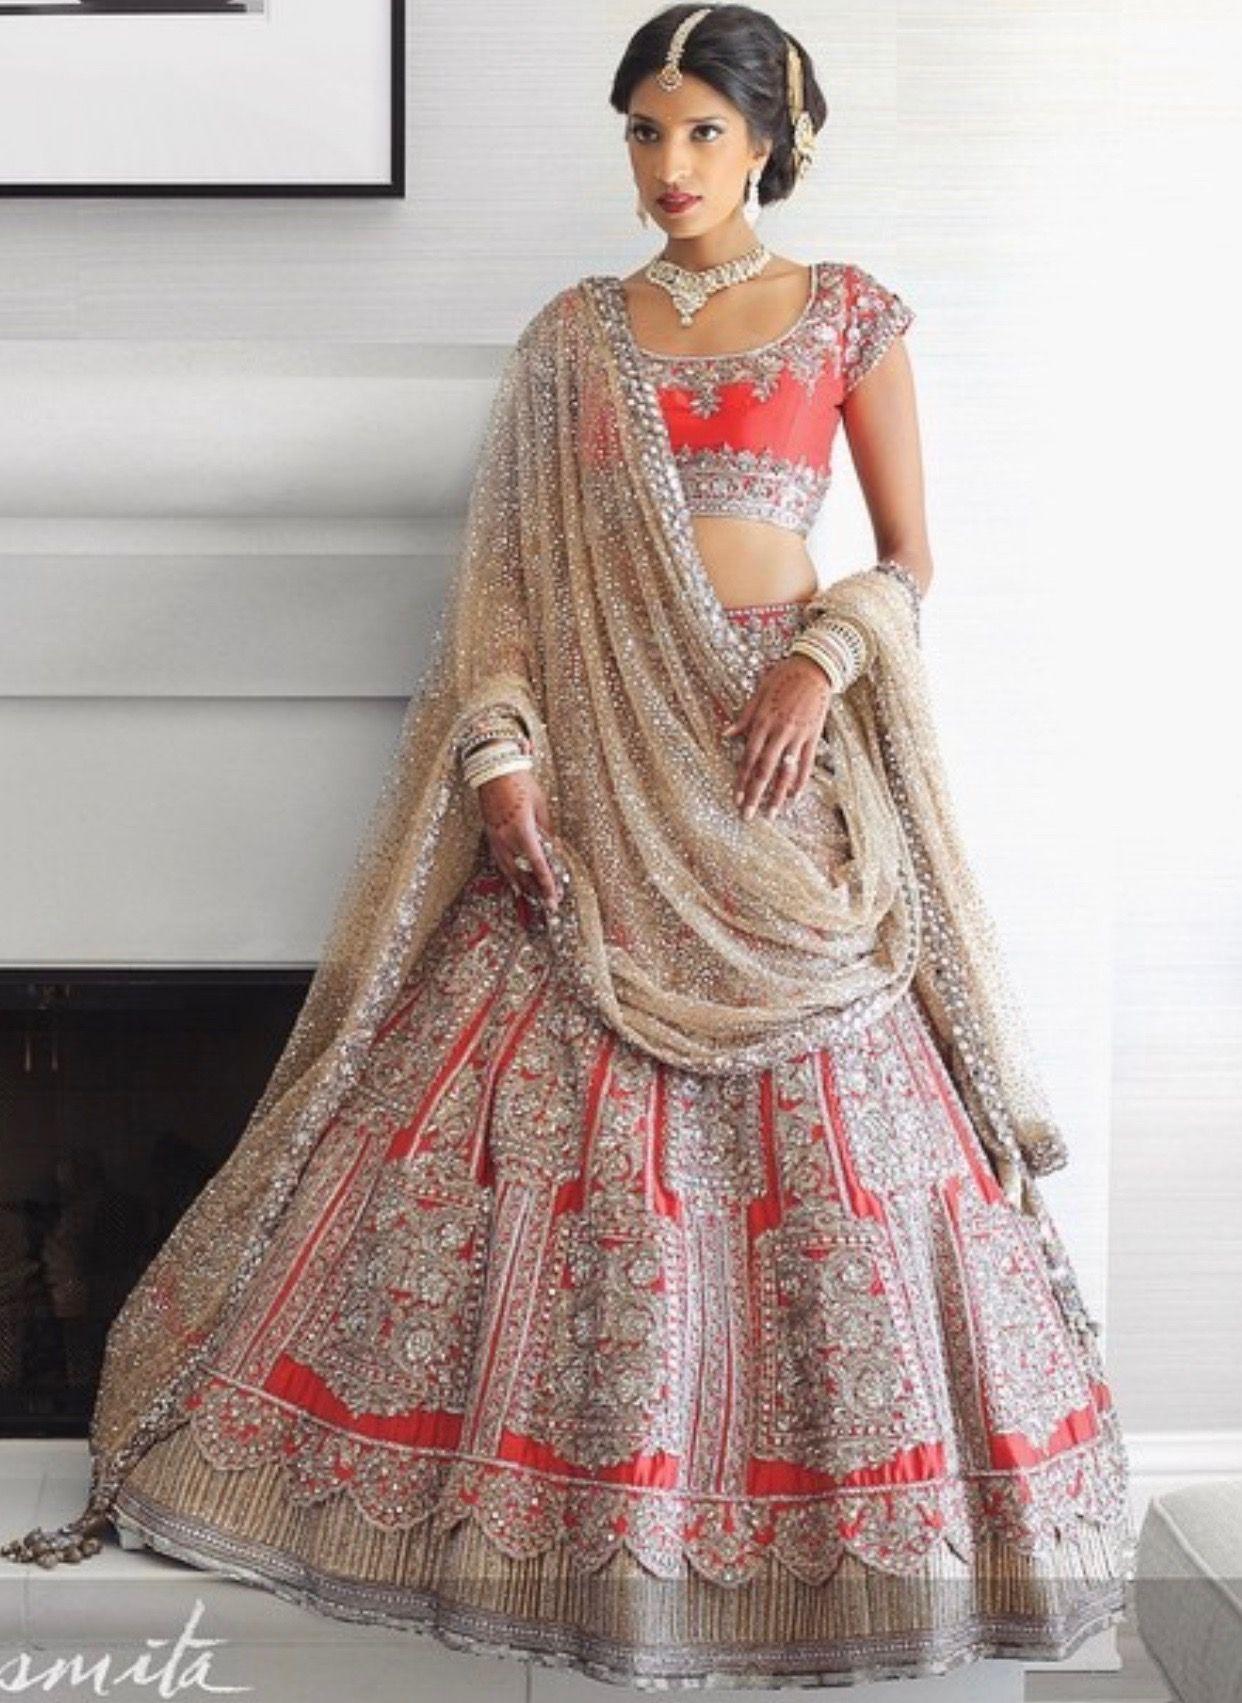 Pin by devasha naidu on fashionista love pinterest wedding saree